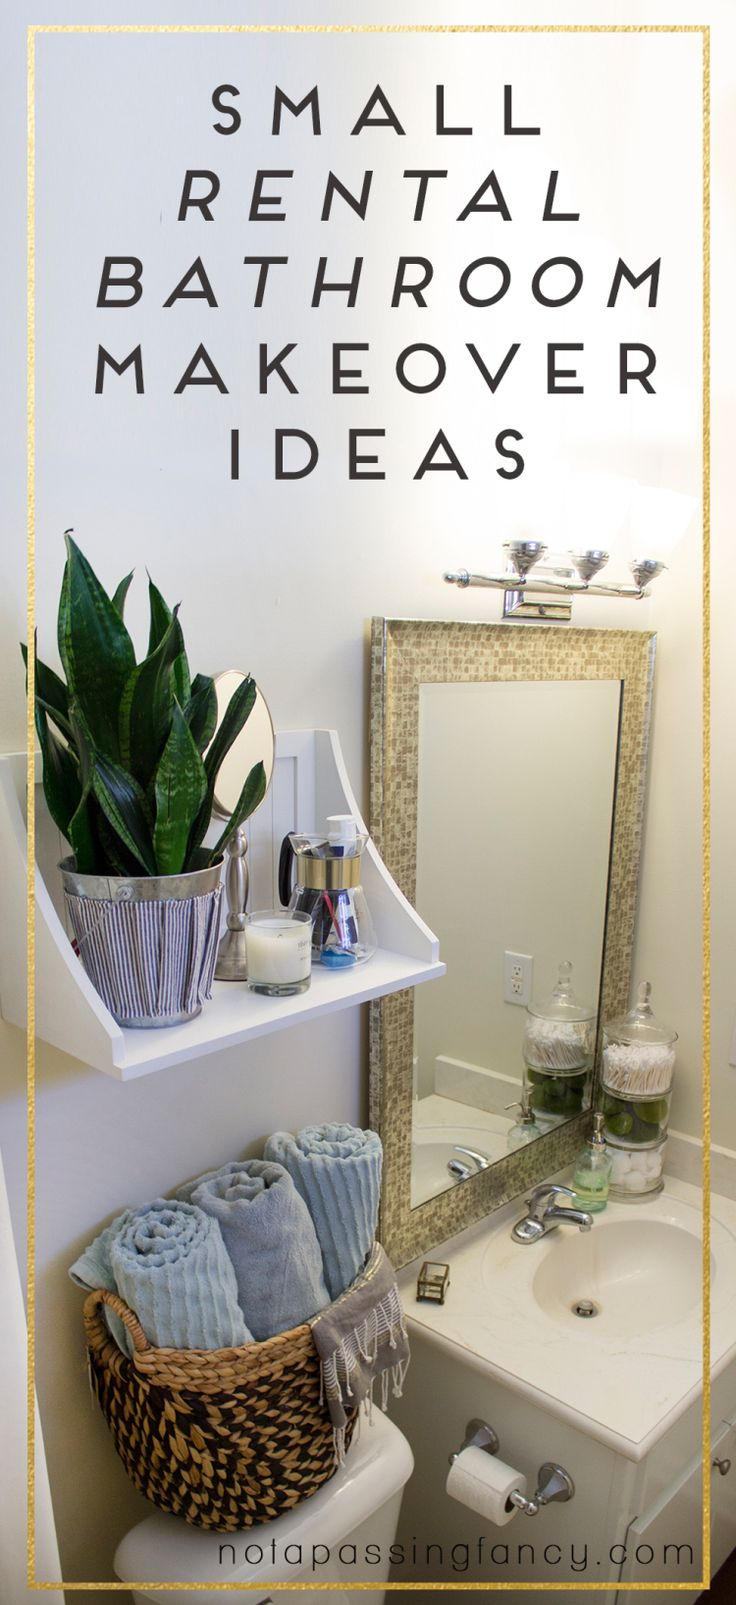 Small bathroom apartment no nightstand